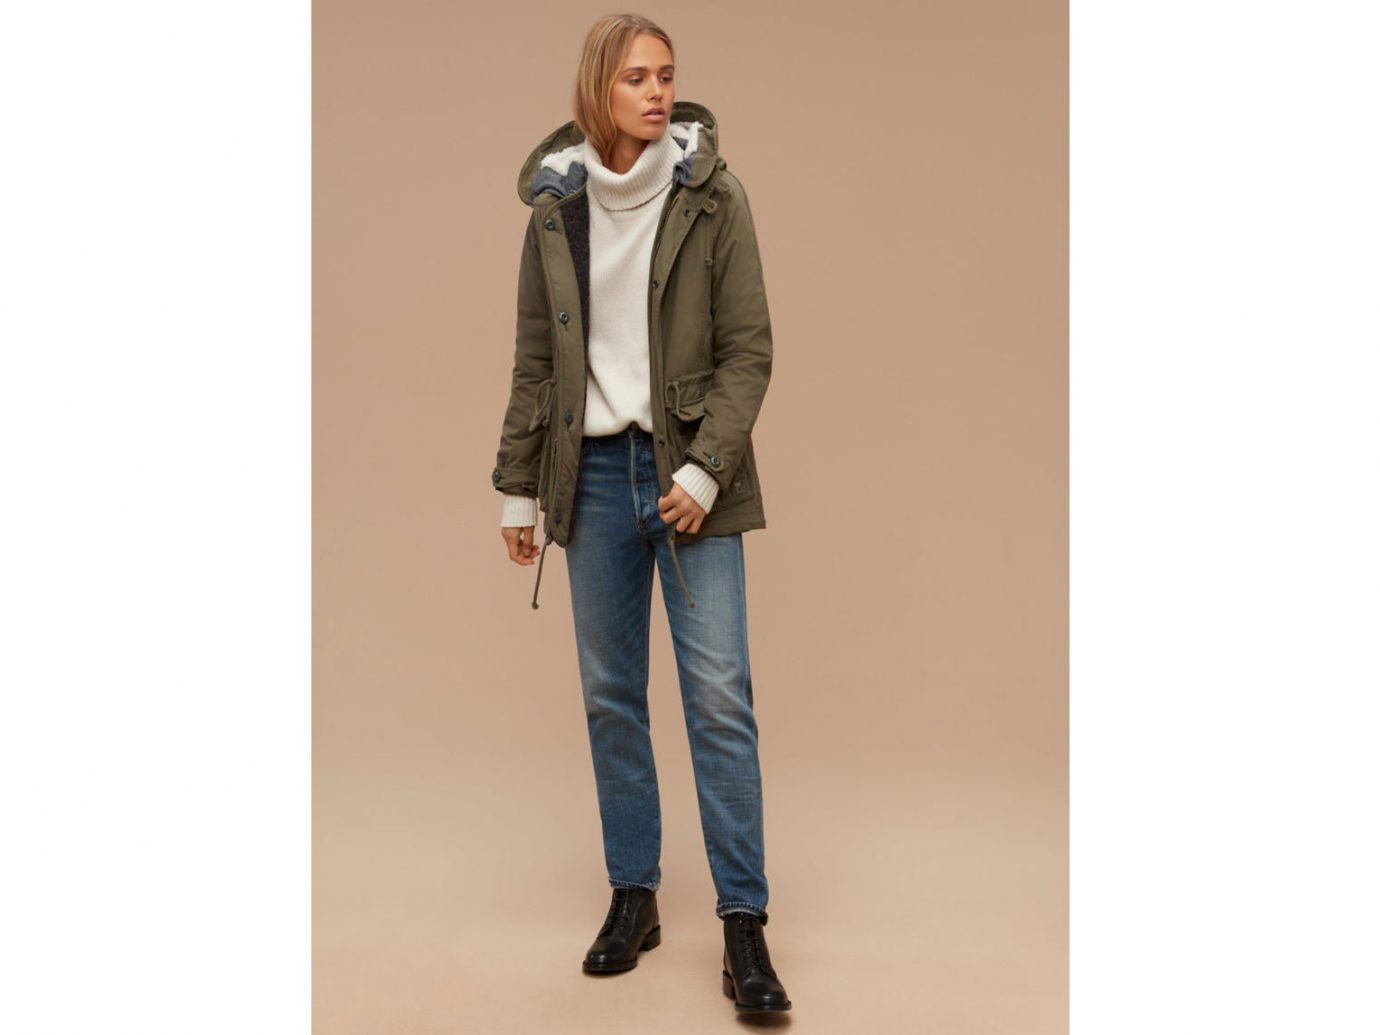 Style + Design standing clothing suit jacket jeans denim outerwear sleeve leather blazer posing coat textile pocket pattern trouser